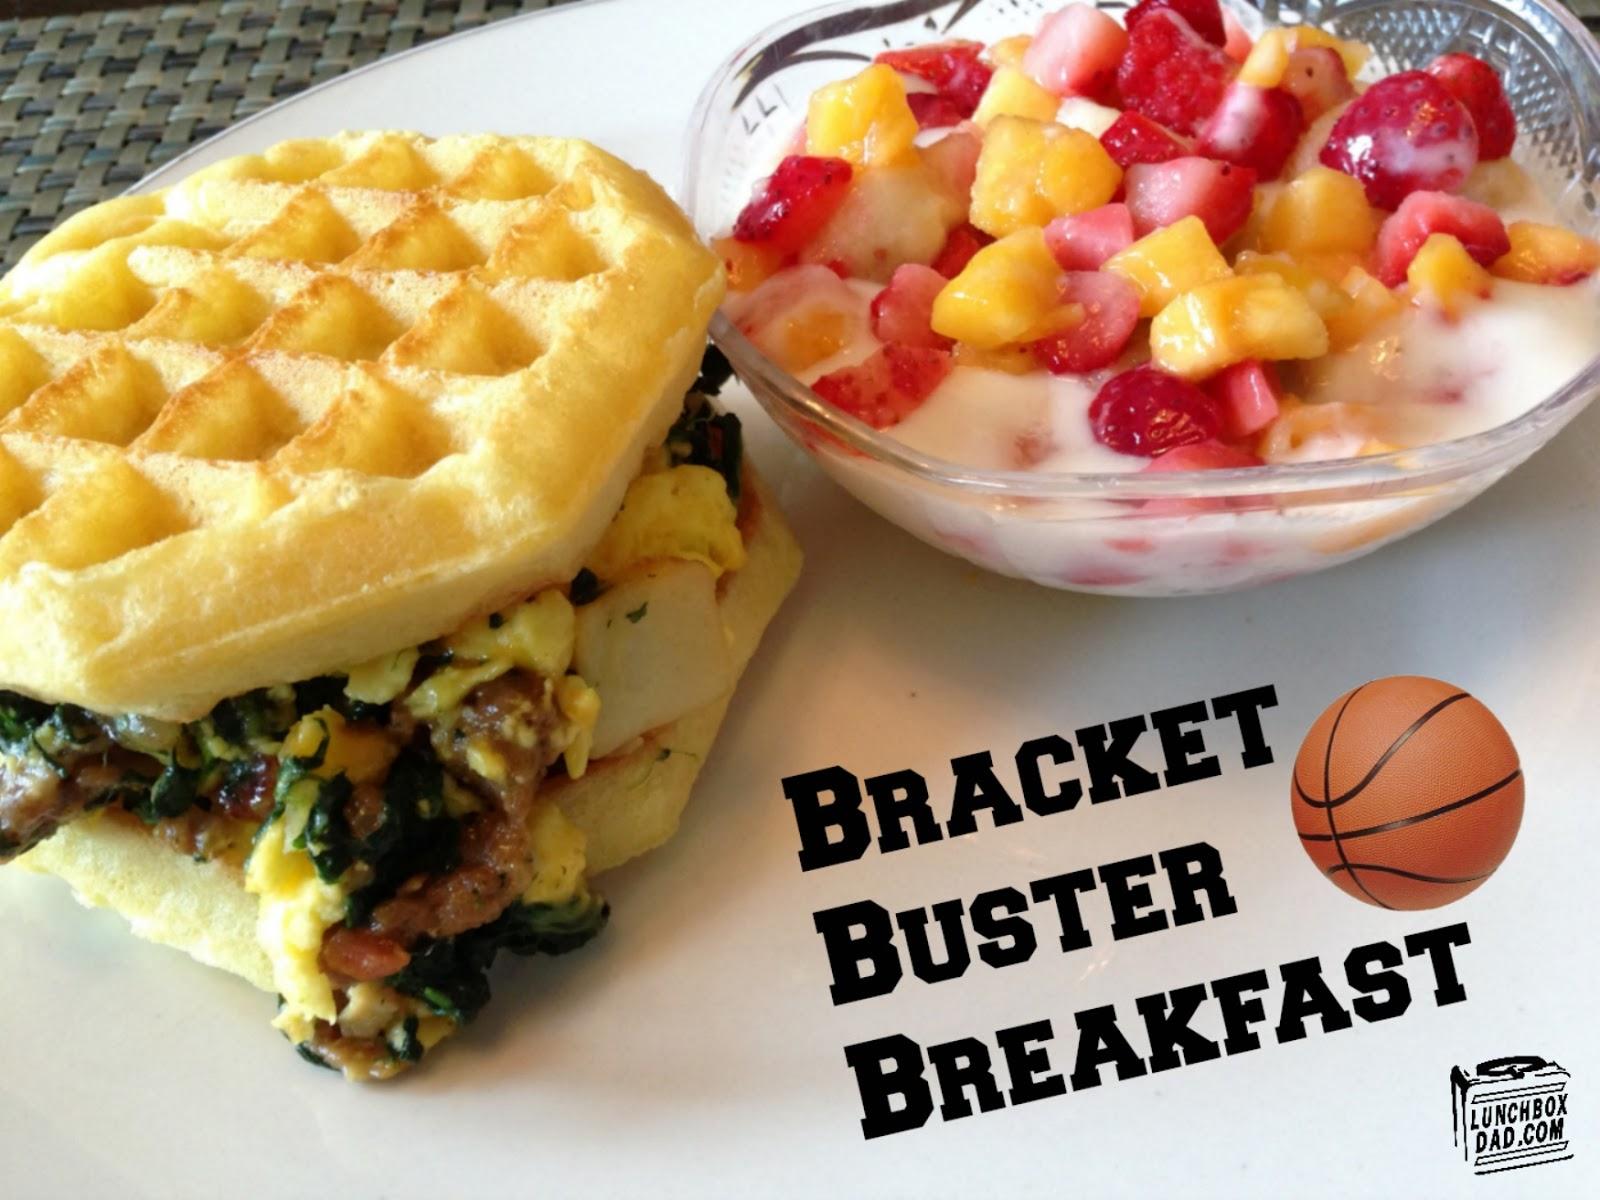 Bracket Buster Breakfast #FrozenChefMadness